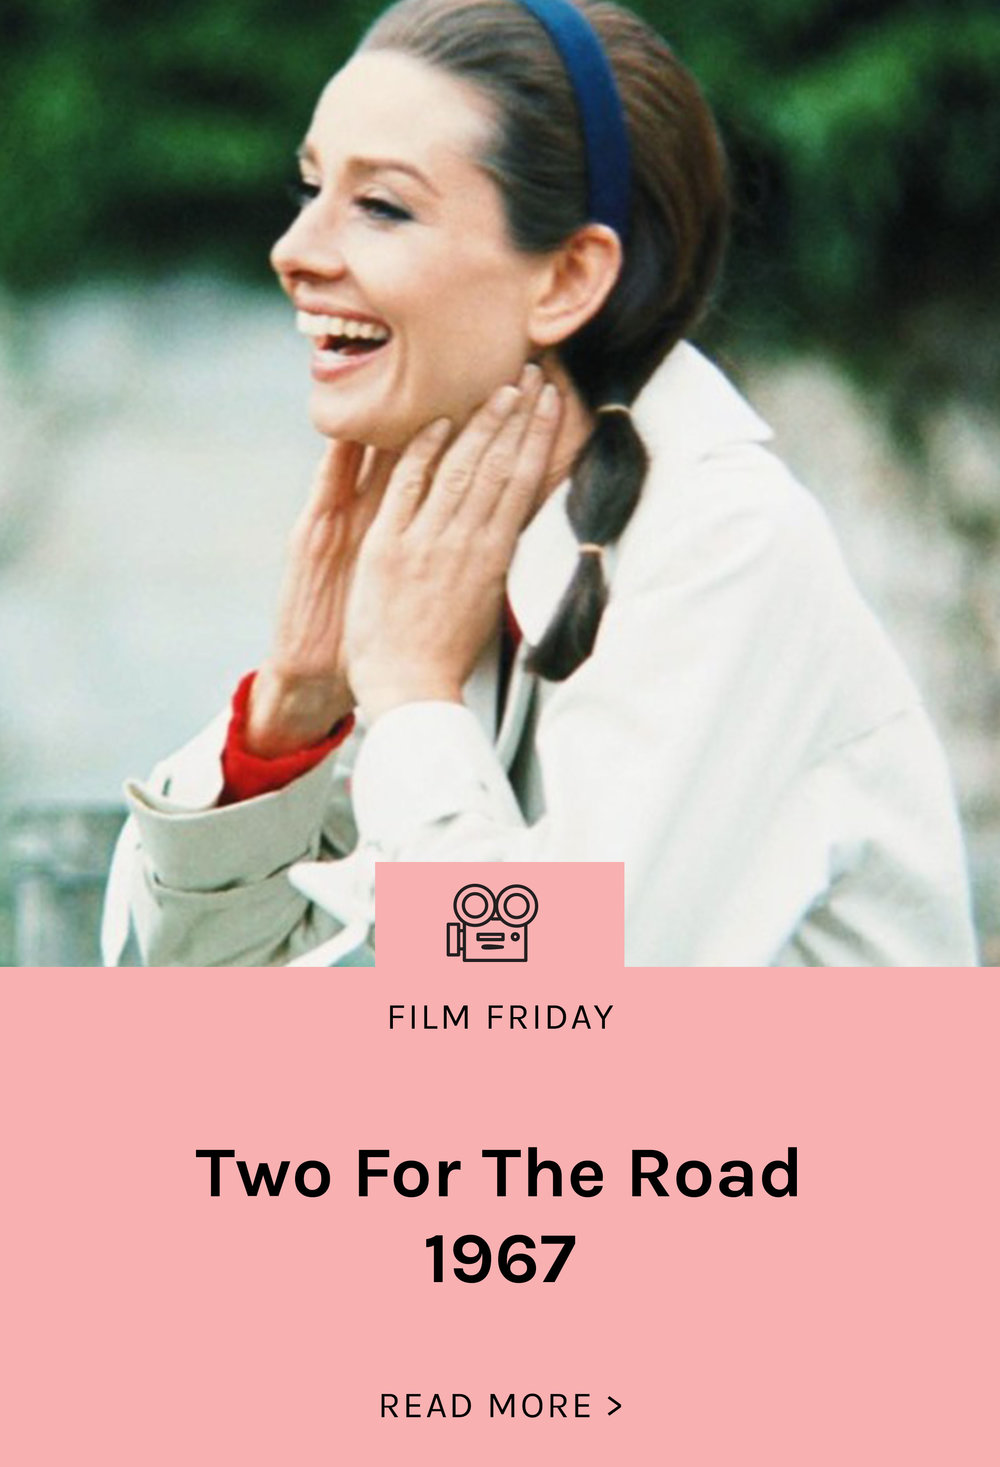 Lisa-Says-Gah-Film-Friday-Two-For-The-Road-Landing.jpg